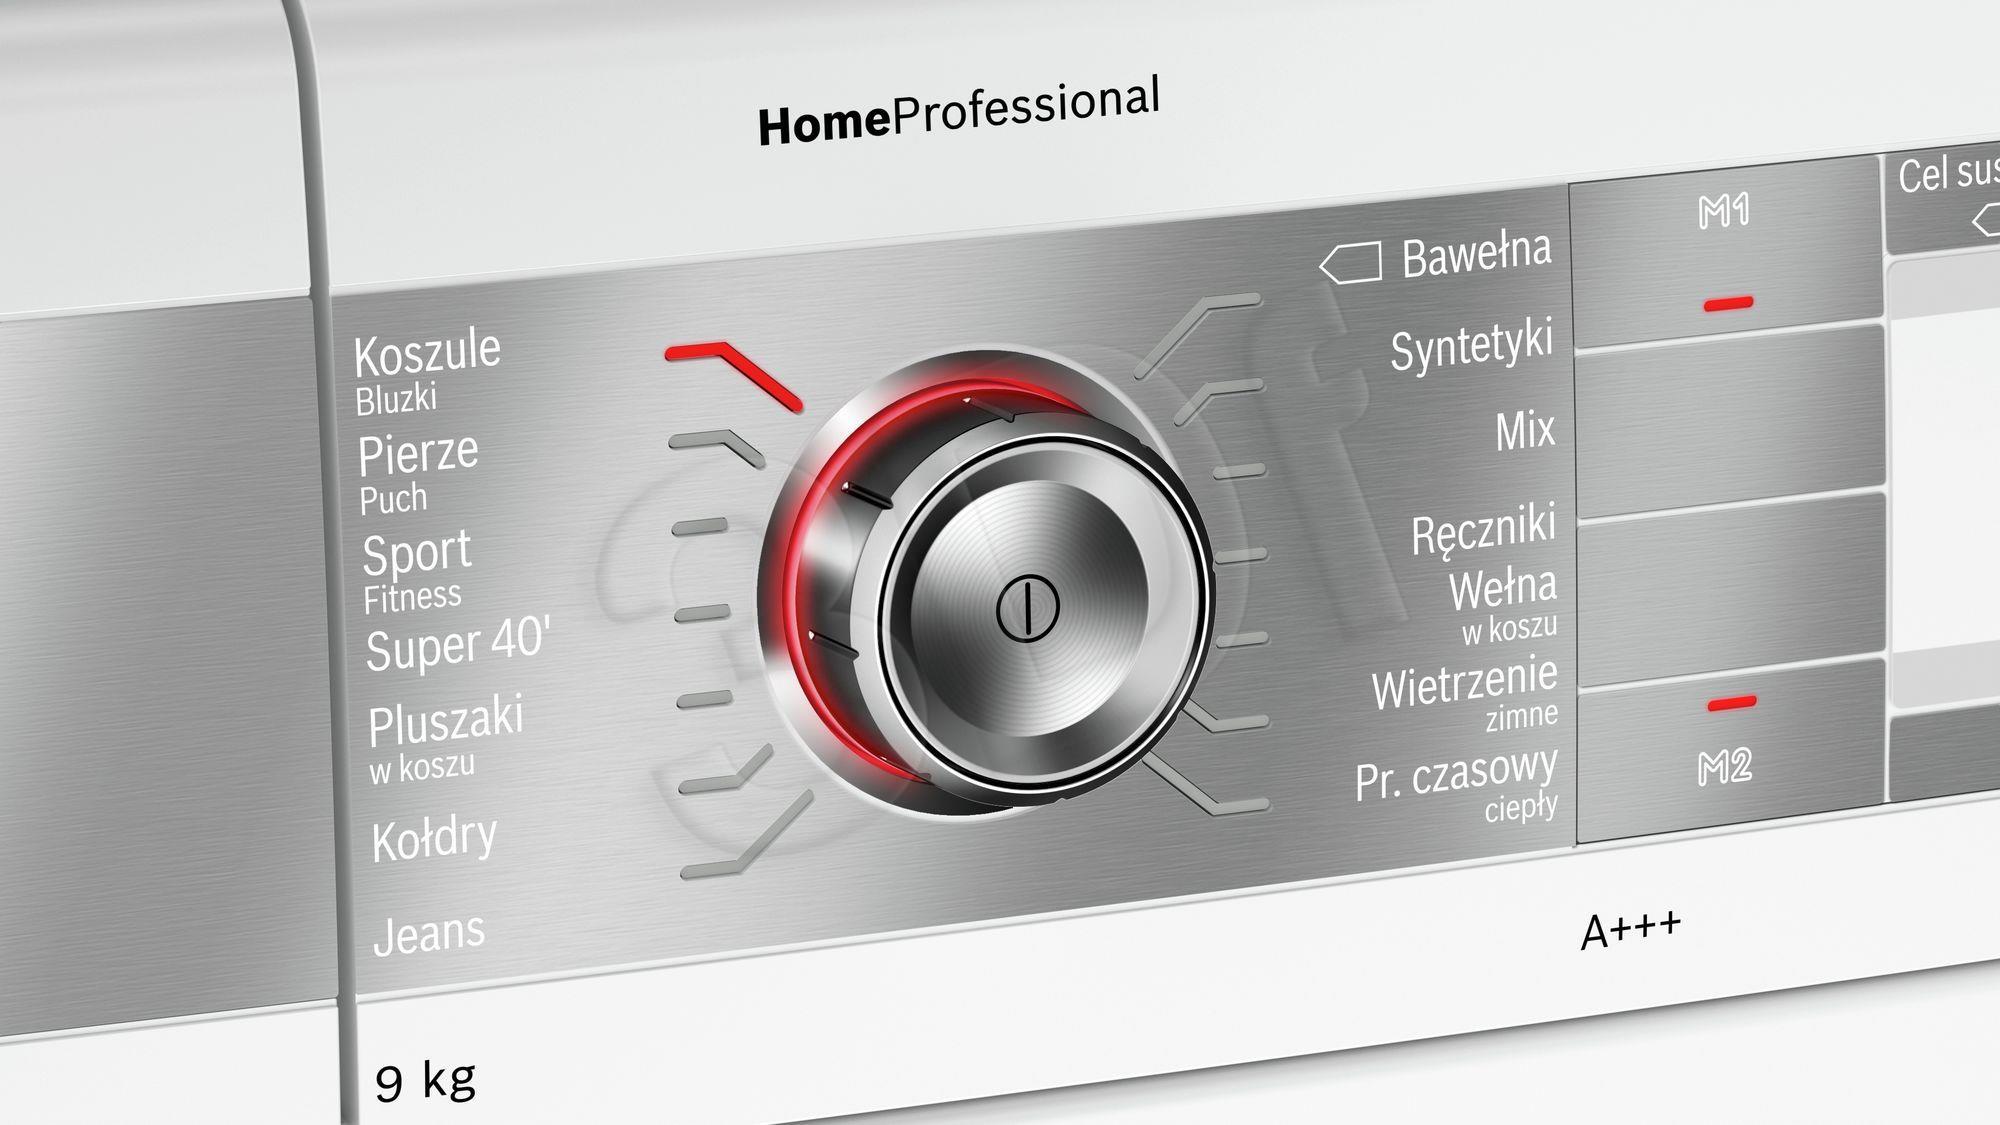 Dryer    BOSCH  WTY 887W0 PL (9 kg; 599 mm) WTY 887W0 PL Veļas žāvētājs